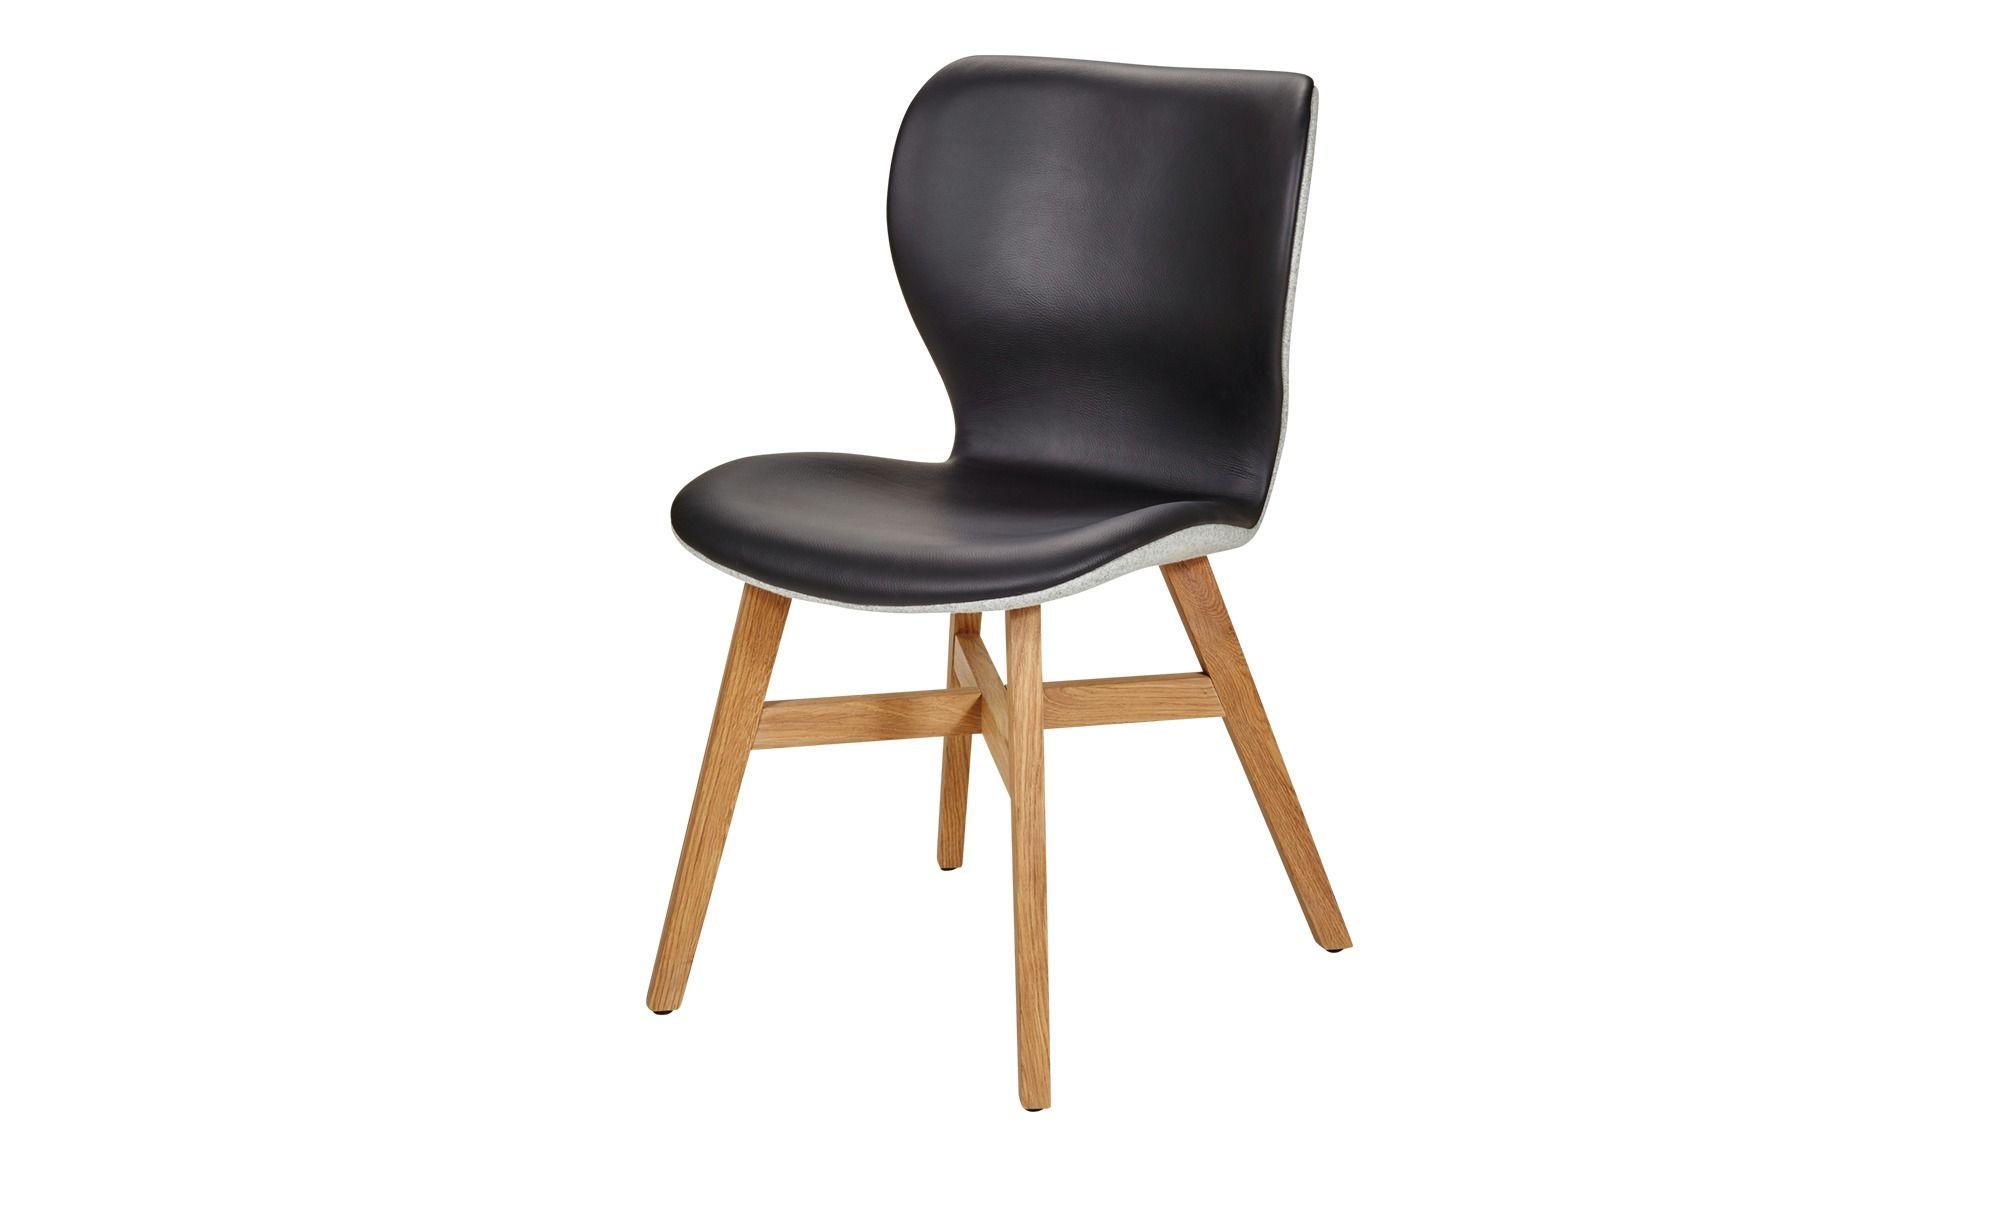 Voglauer V Soft Voglauer V Alpin Spinchair Stuhl With Voglauer V